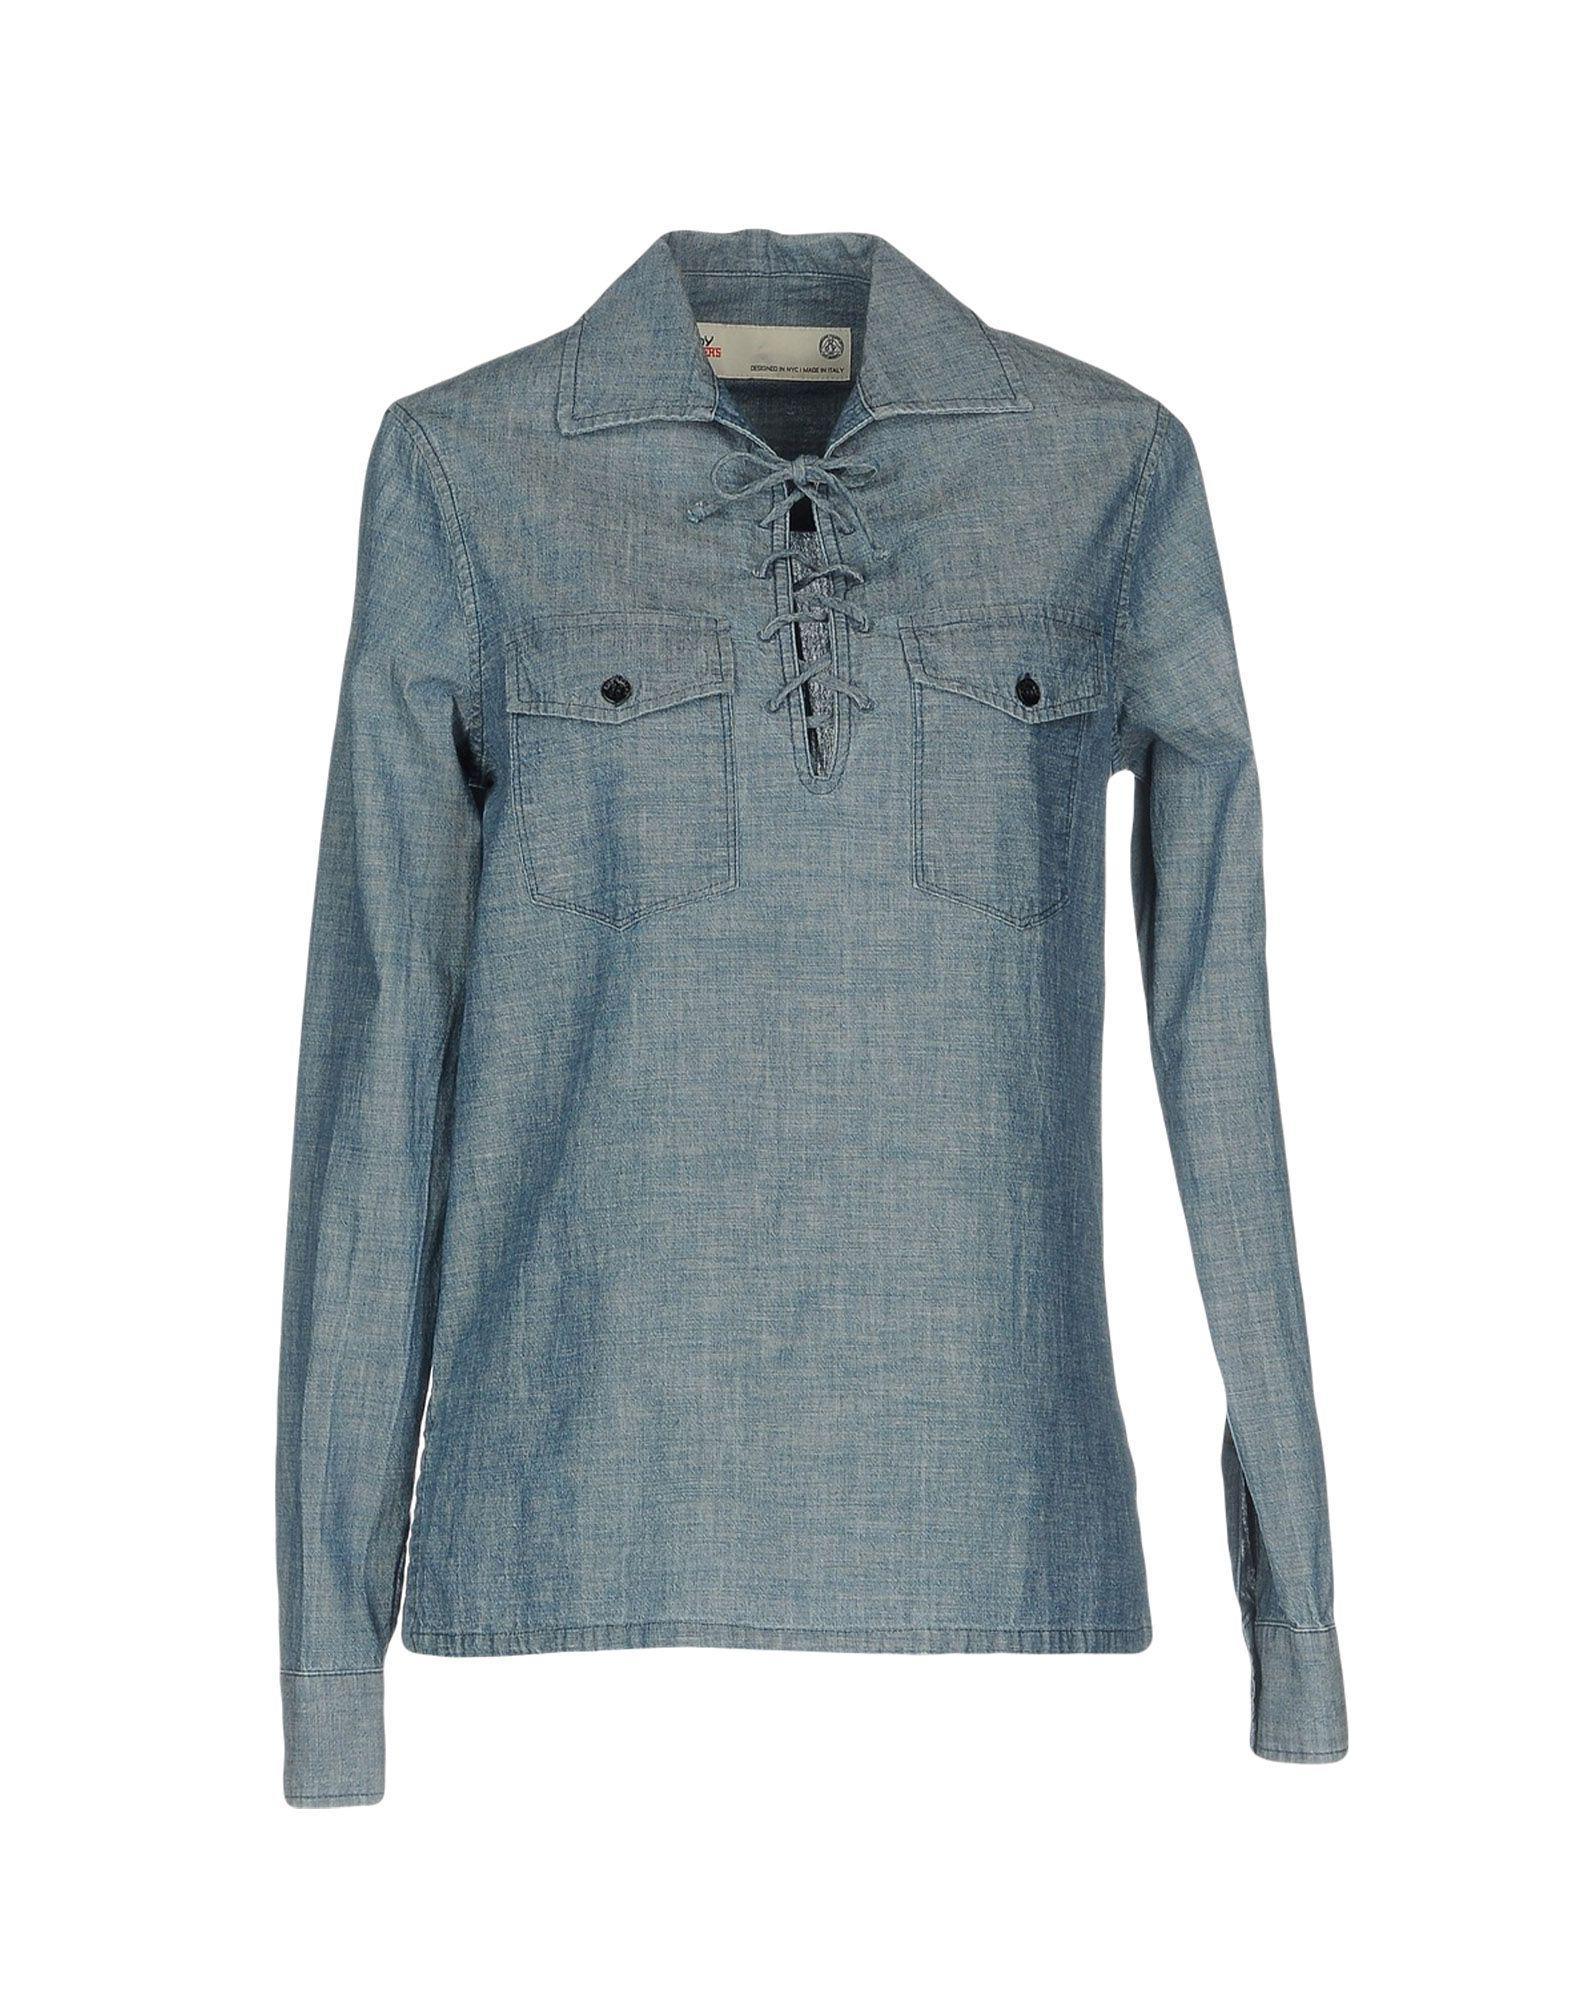 DENIM - Denim shirts Roy Rogers Discount 2018 Newest tkKlVoQI